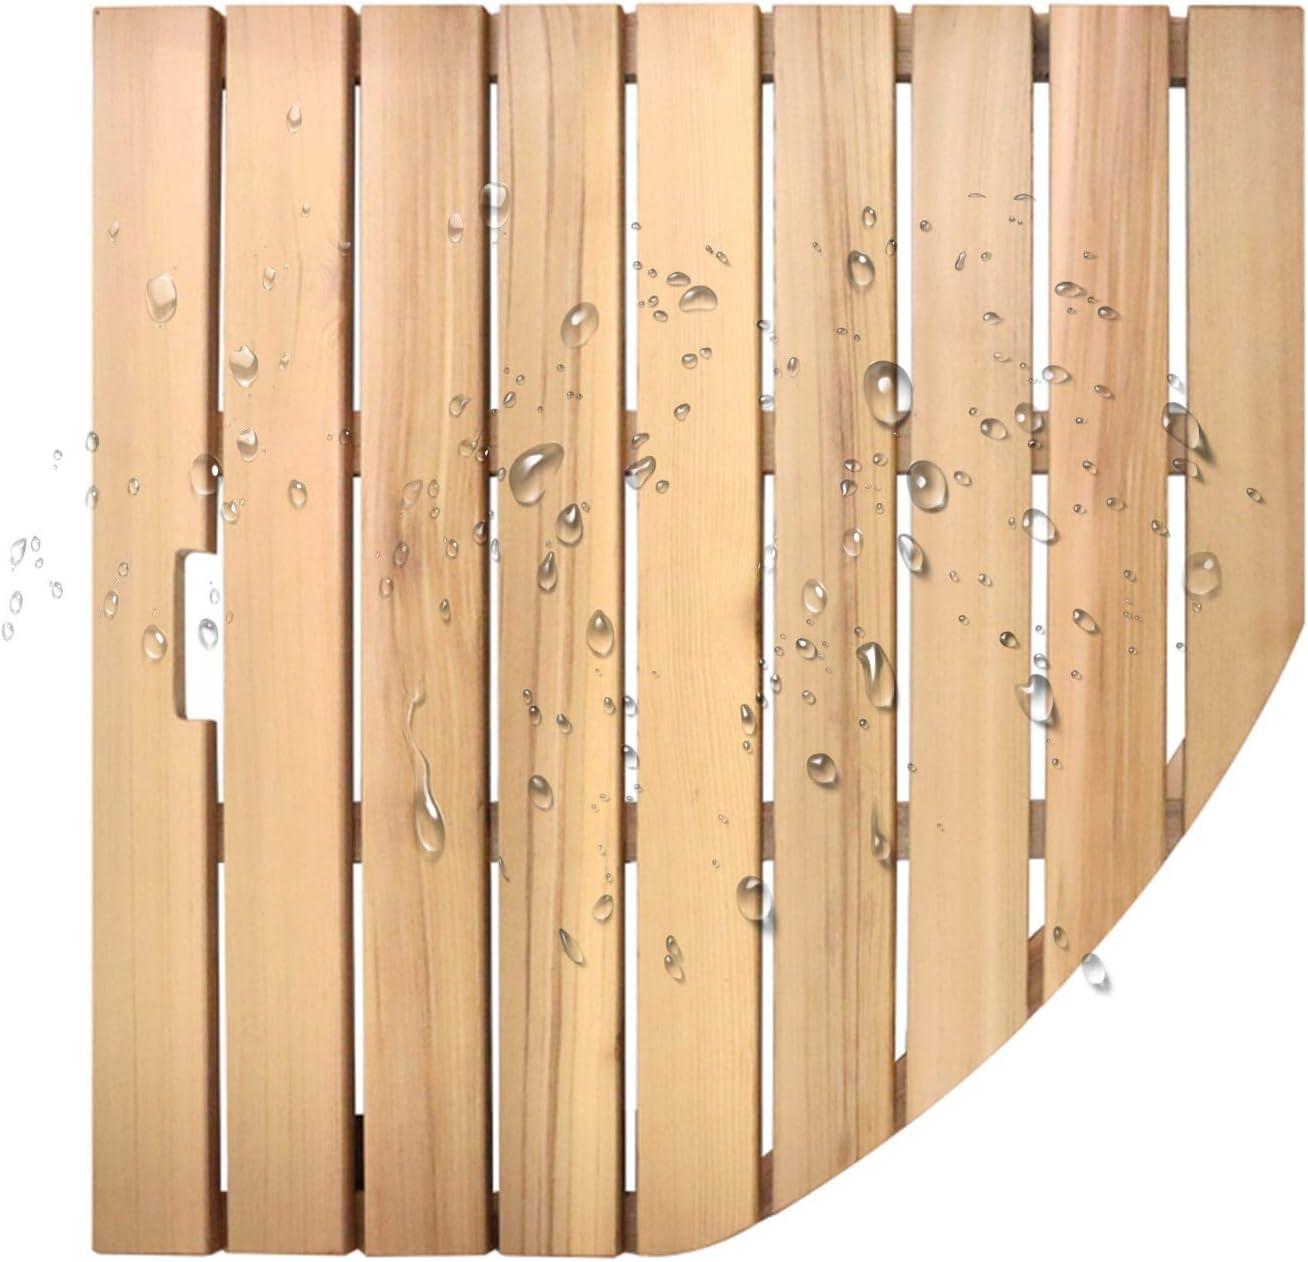 JIAJUAN Natural Wood Shower Bath Drain Board Max 84% OFF Philadelphia Mall Sector Non-Sli Mat